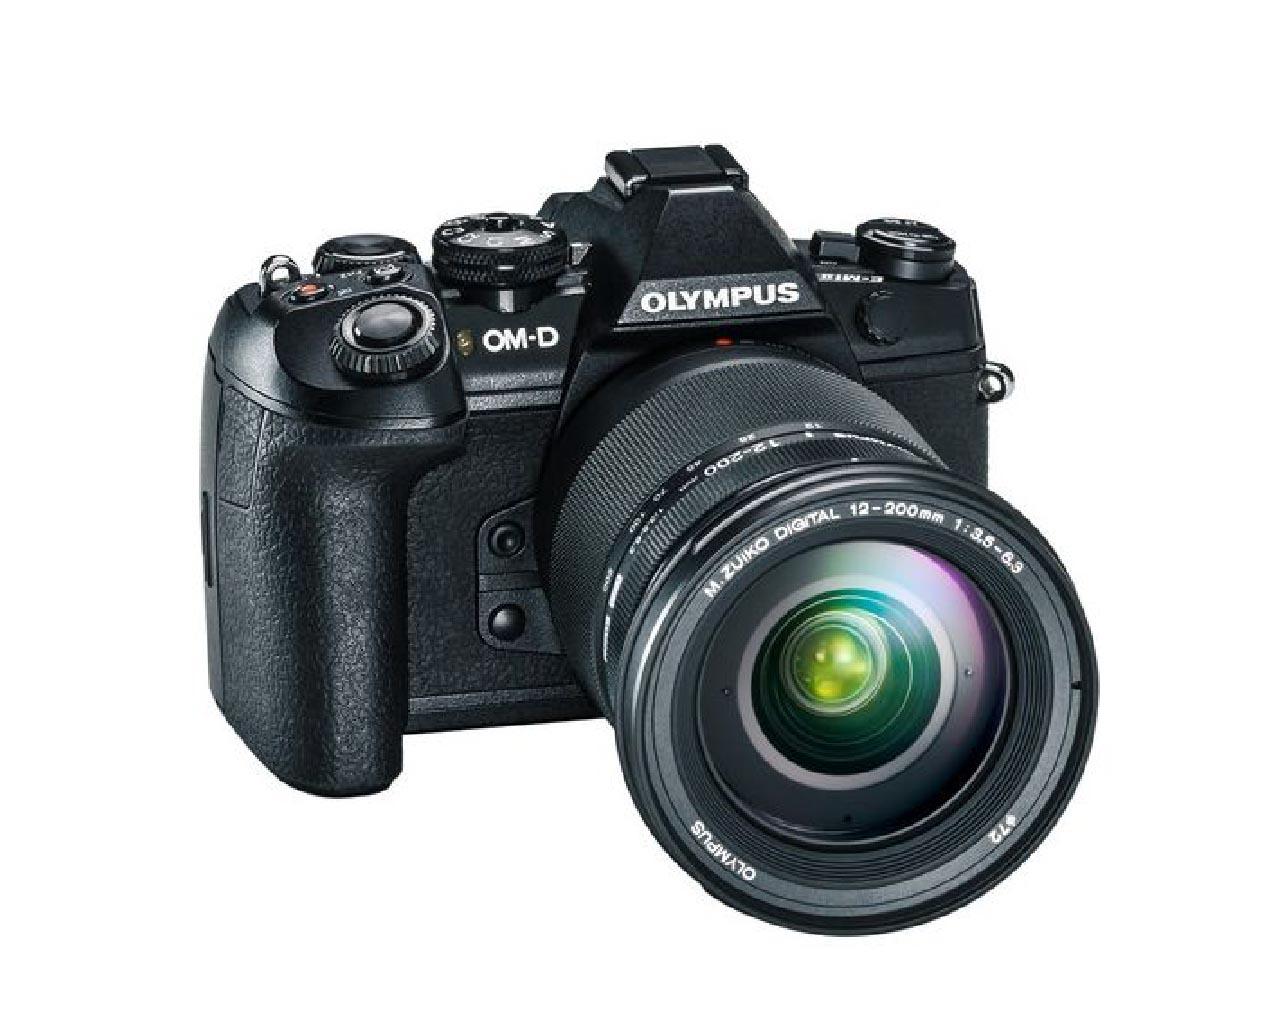 Profoto Equipo Fotográfico | Master Class Photographers